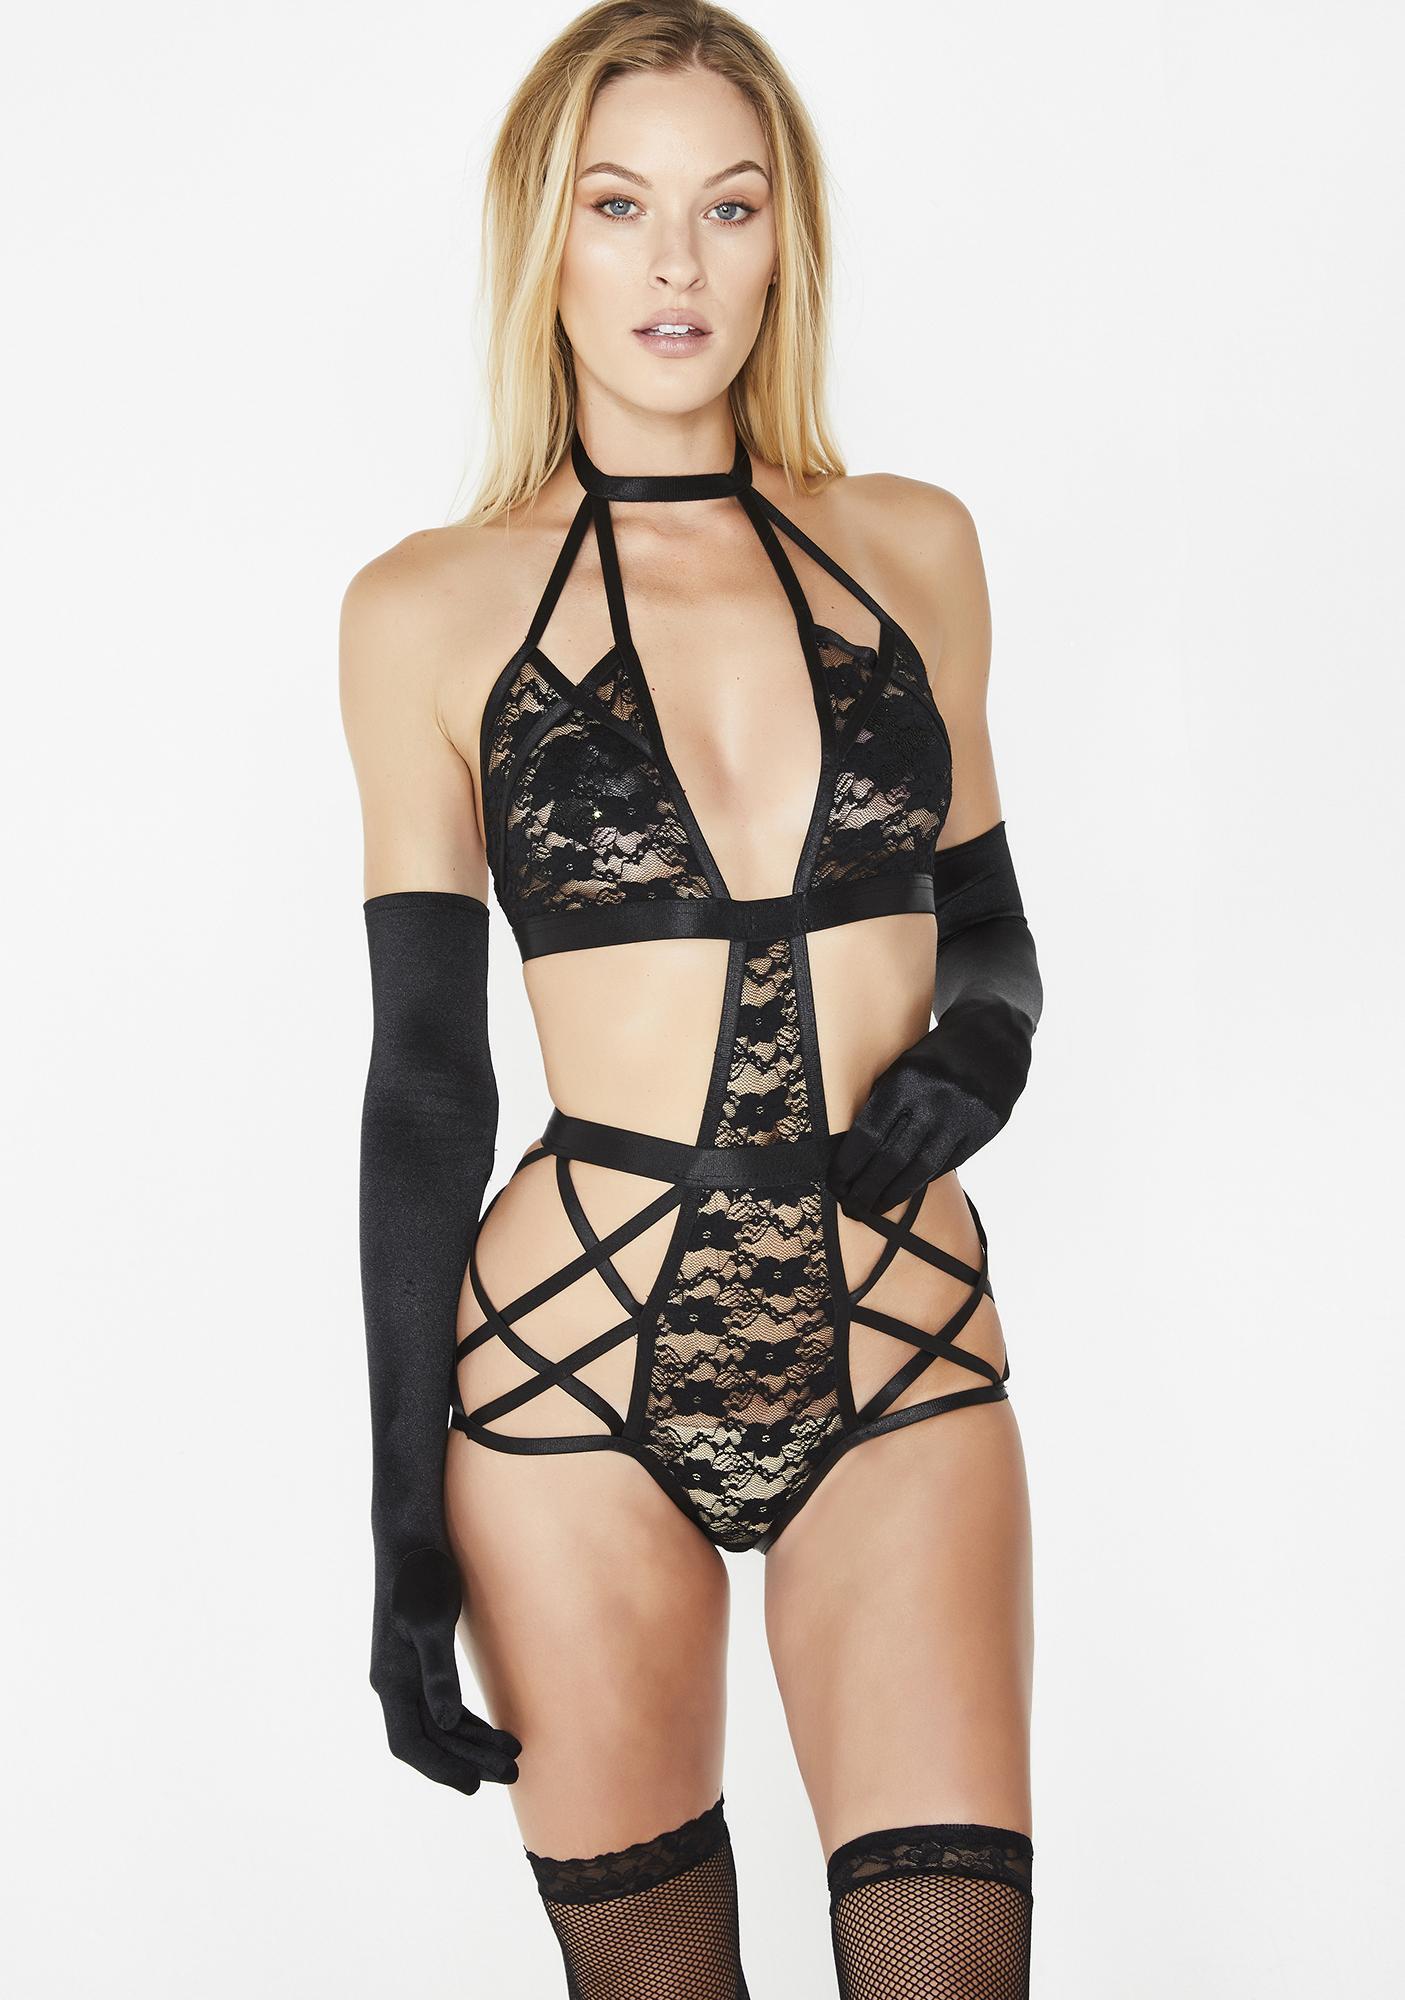 908153a7236b Cutout Strappy Sheer Lace Bodysuit Black